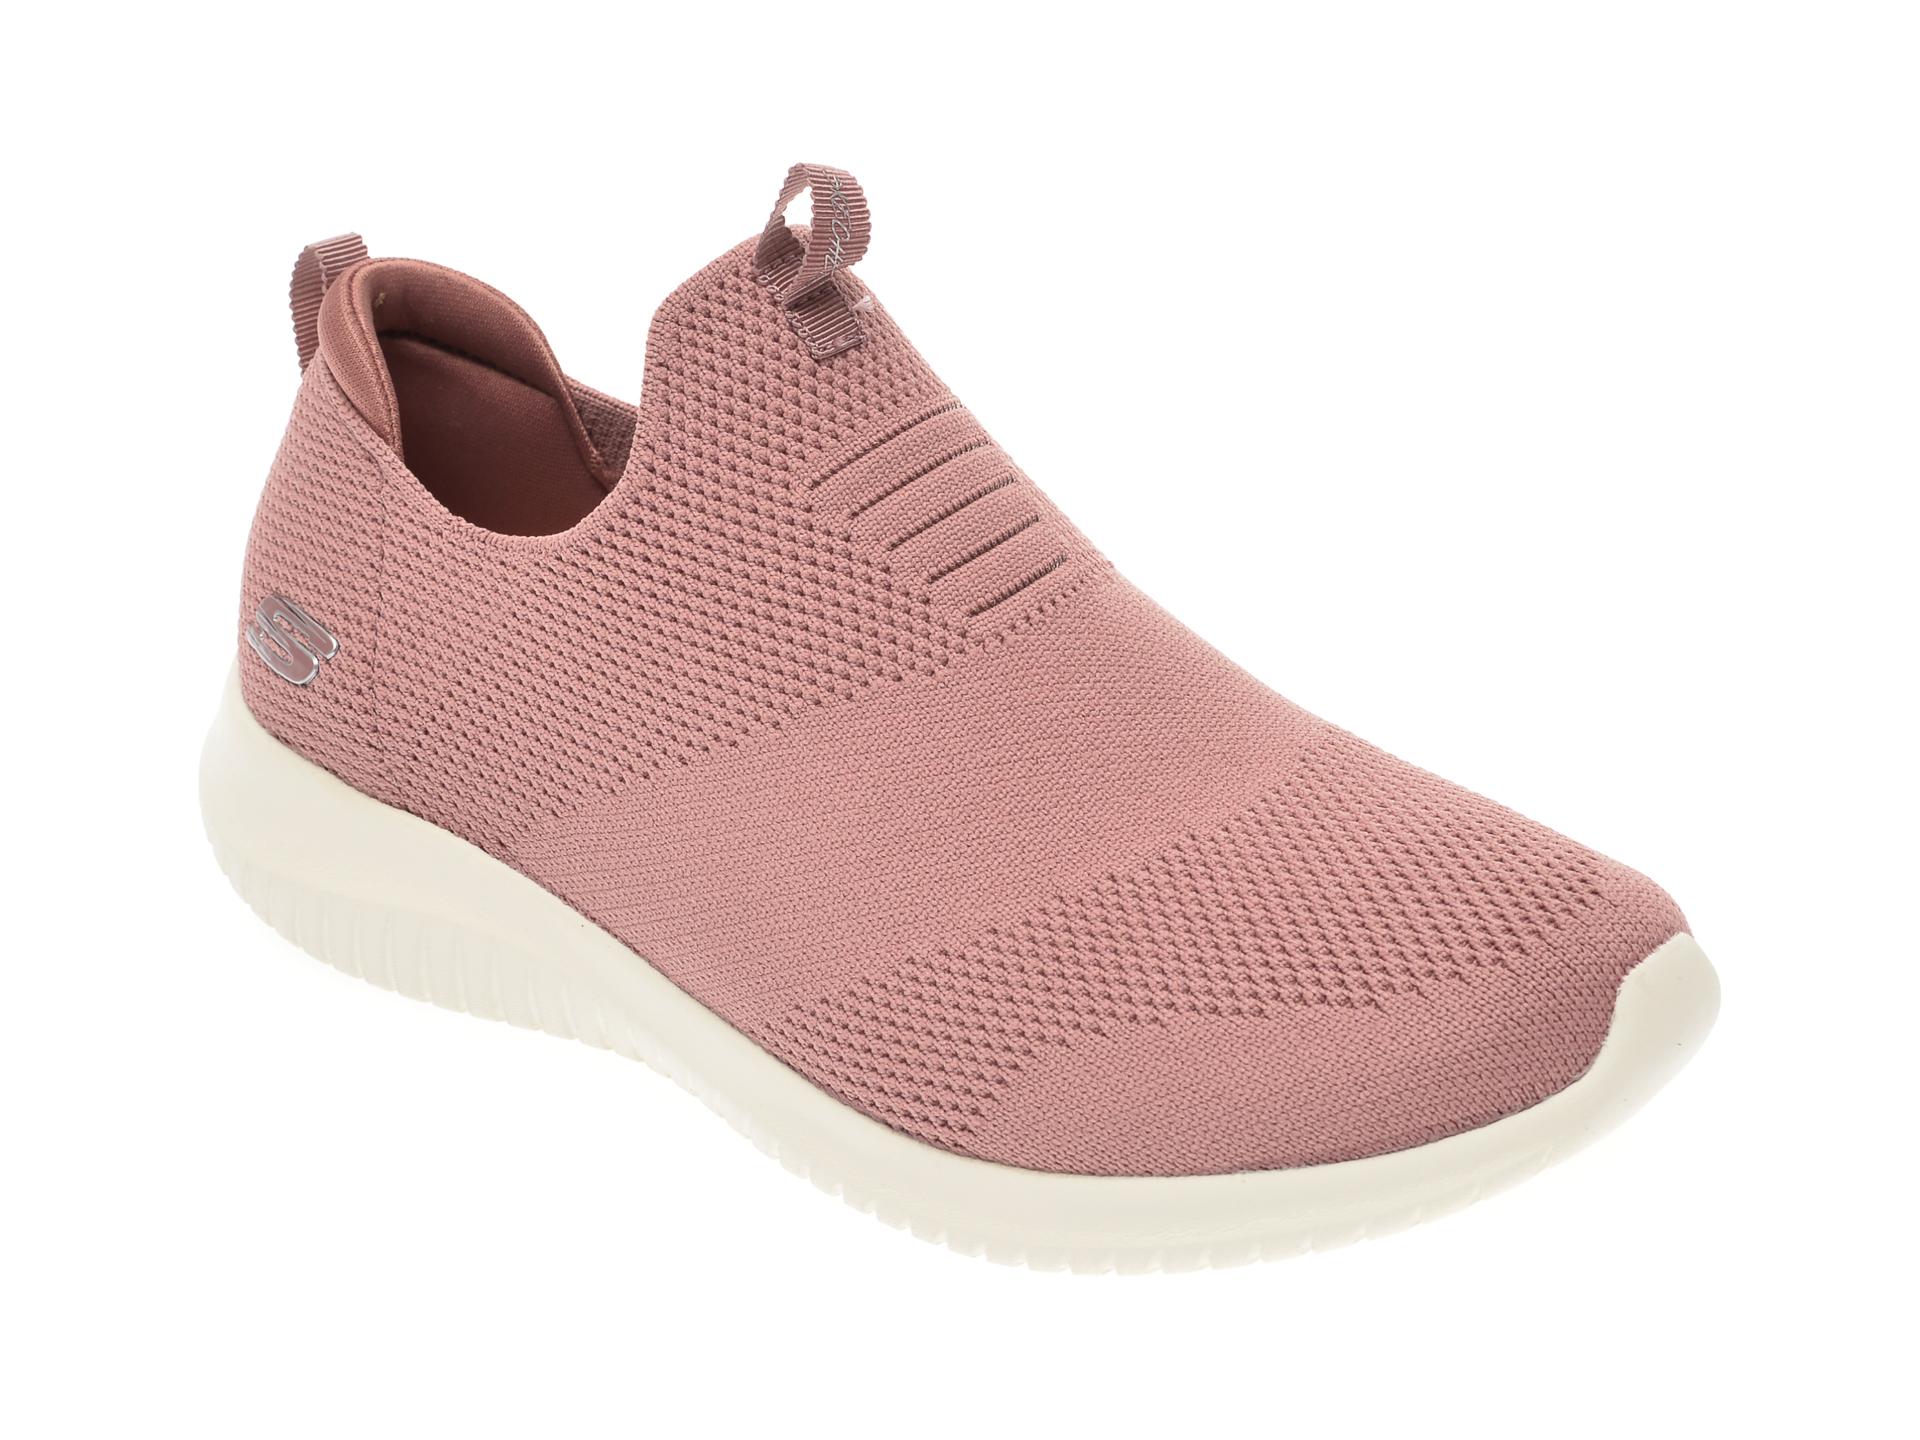 Pantofi sport SKECHERS roz, Ultra Flex First Take, din piele ecologica